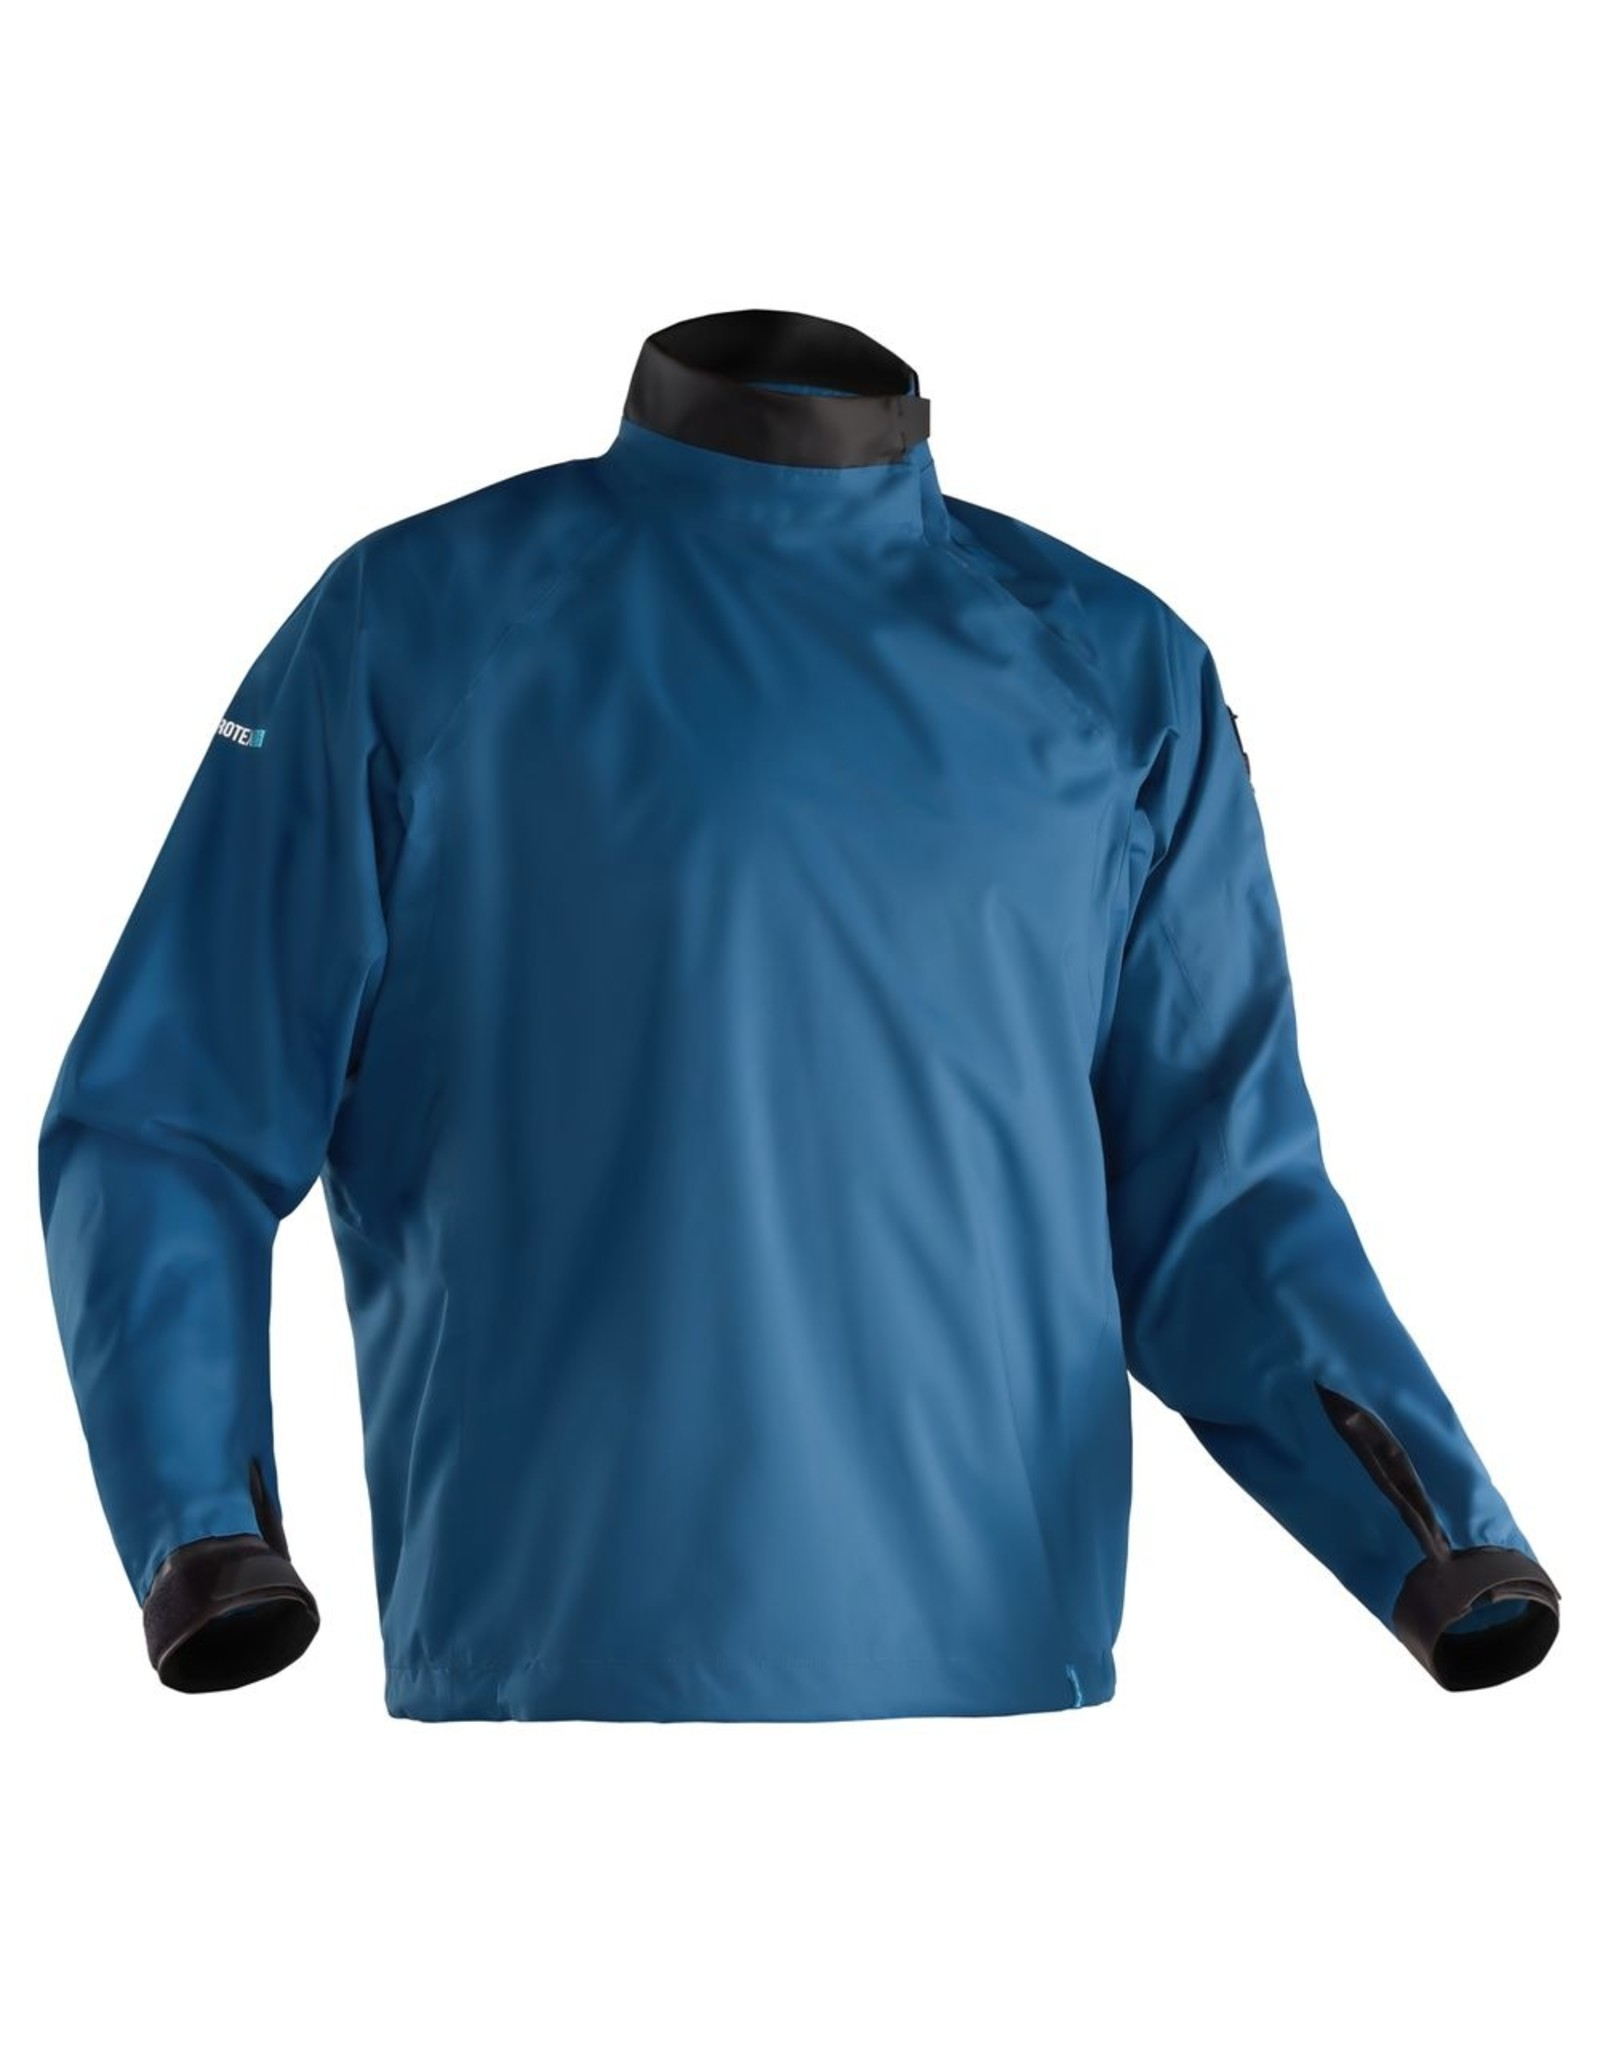 NRS NRS Jacket Endurance Homme